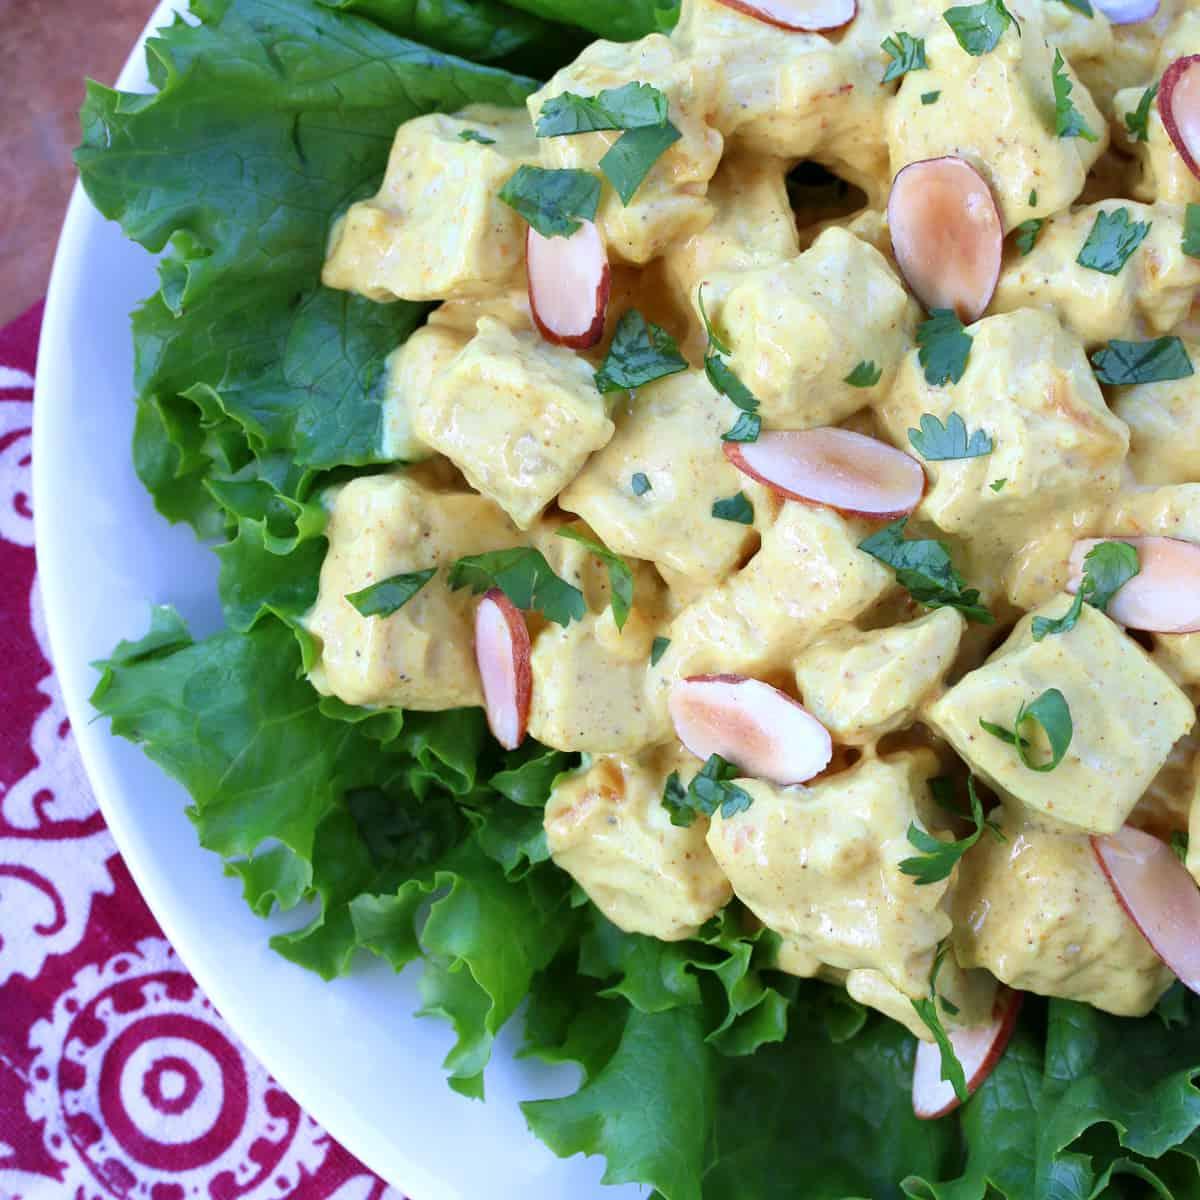 coronation chicken recipe best Queen Elizabeth England British English curry powder mango apricot almonds